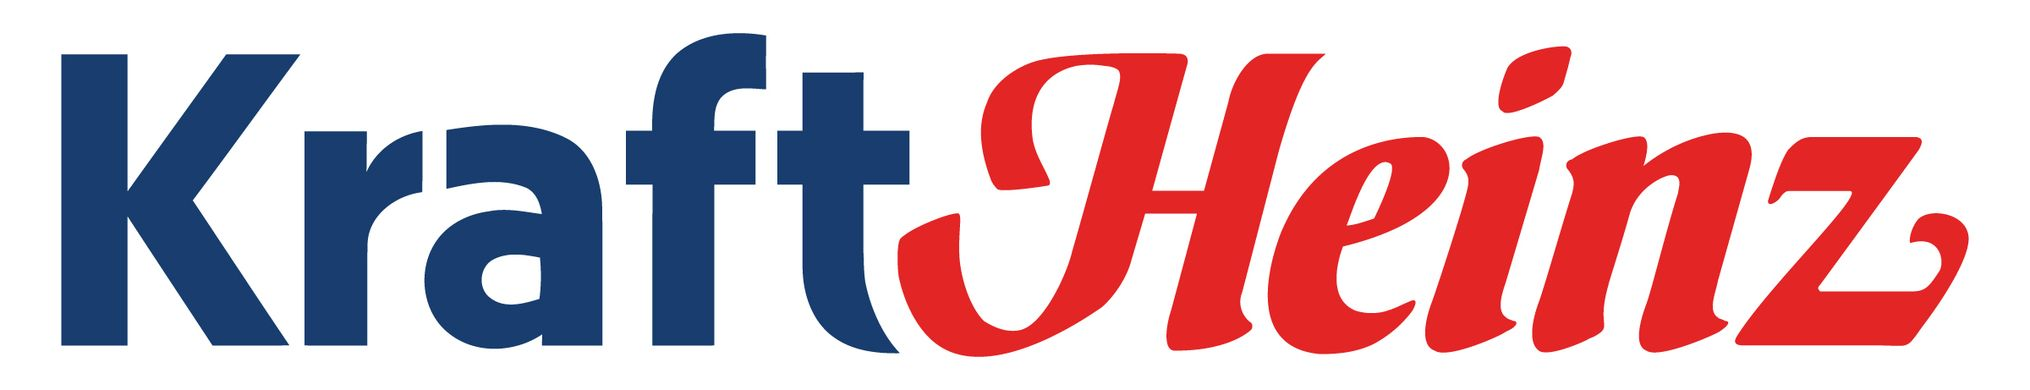 kraft_Heinz_logo